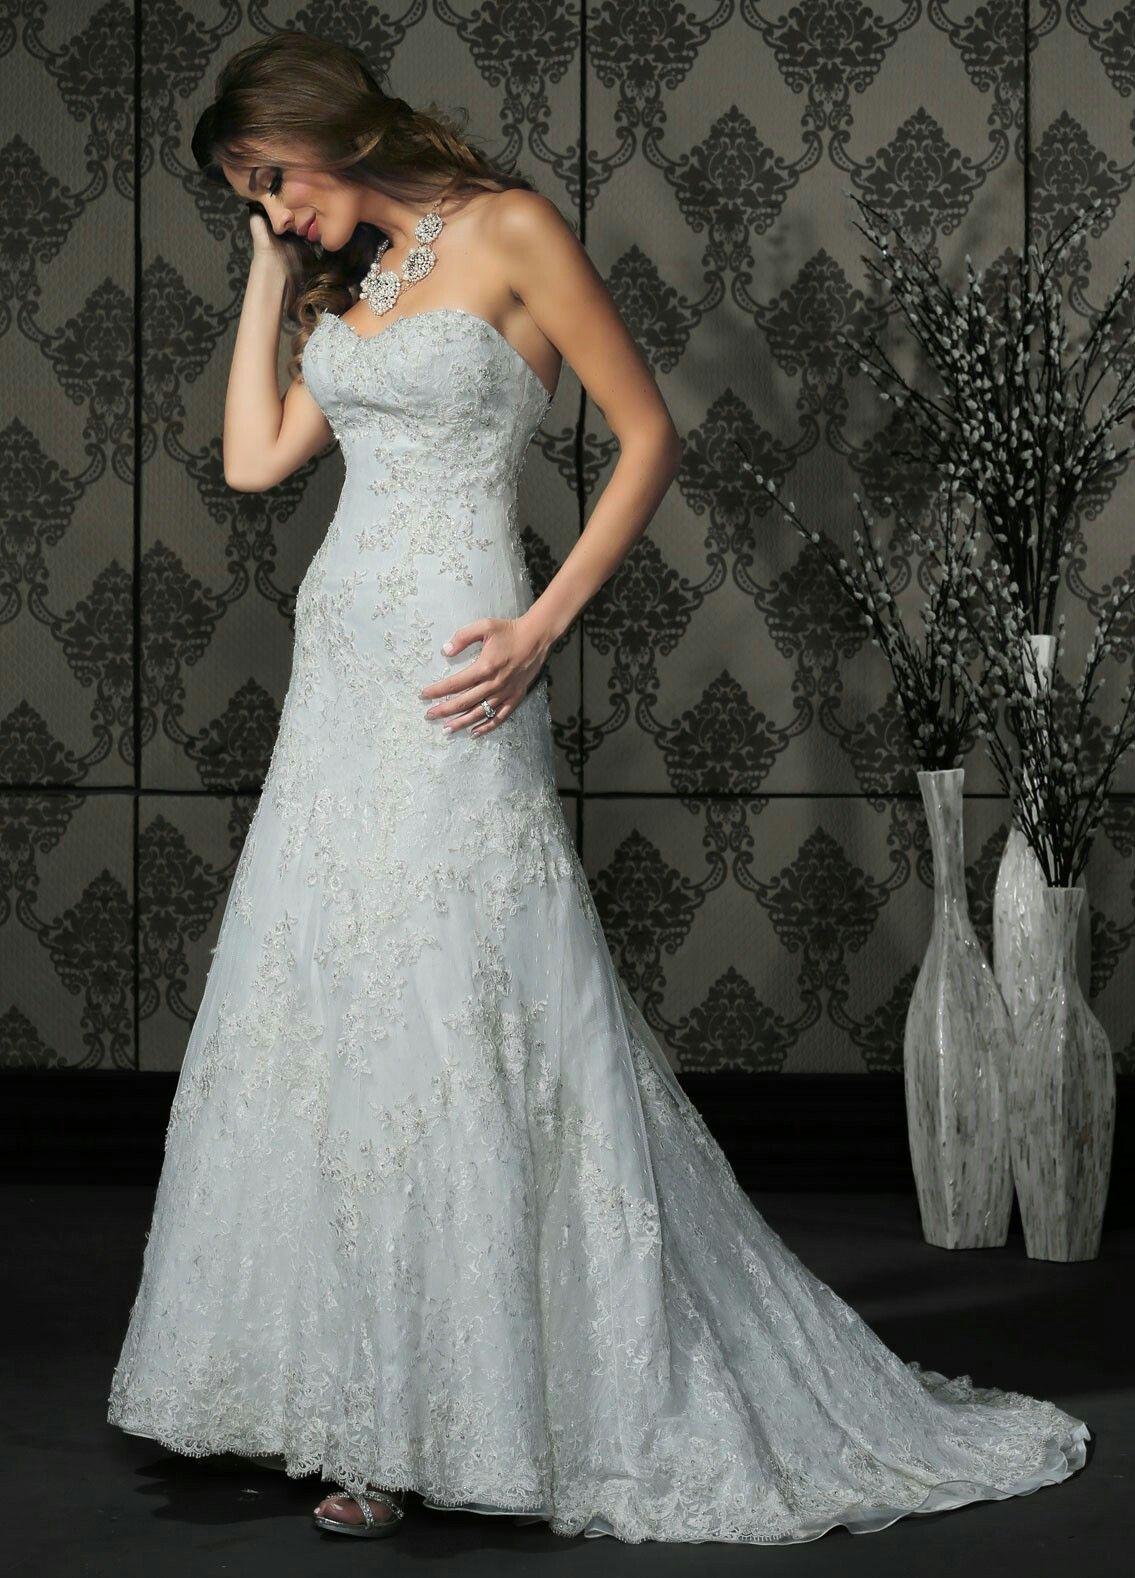 Impression bridal, Bellisima Bridal Kalamazoo, MI